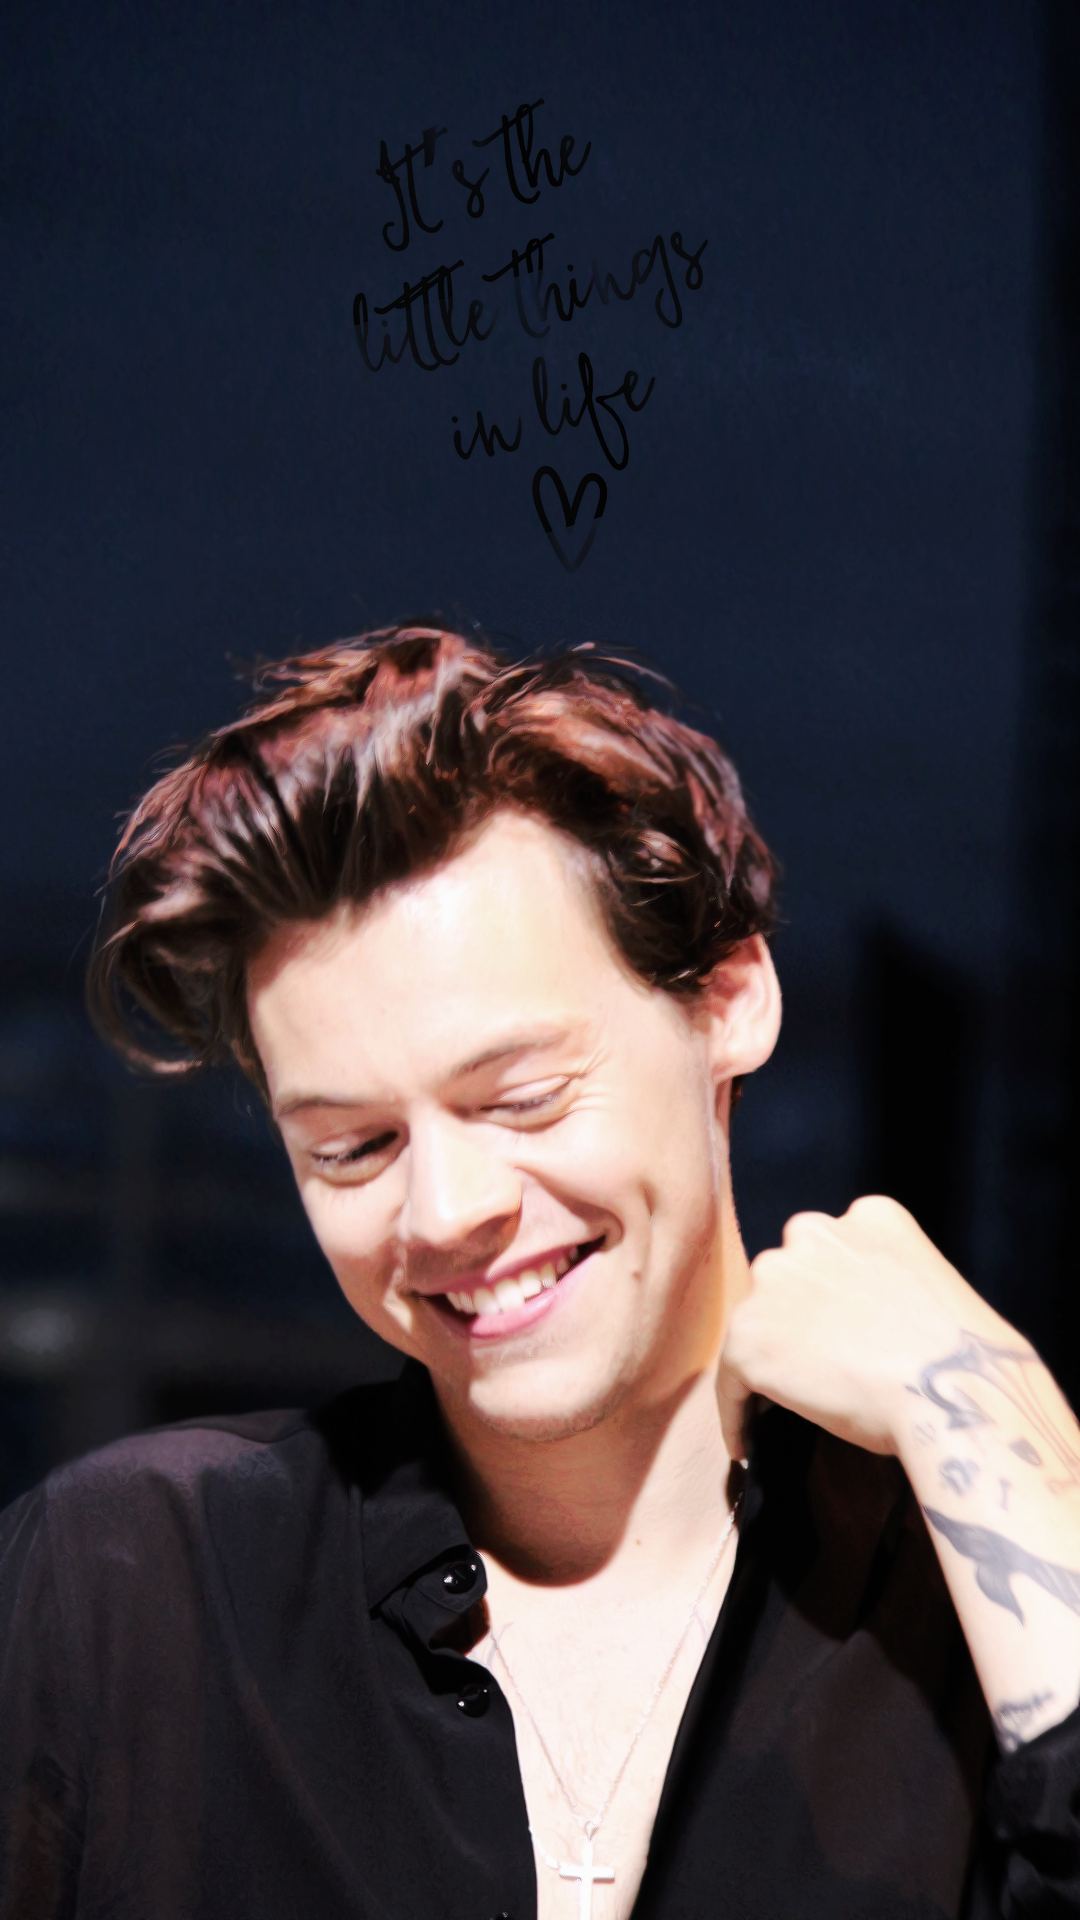 harry styles | Tumblr | Harry styles